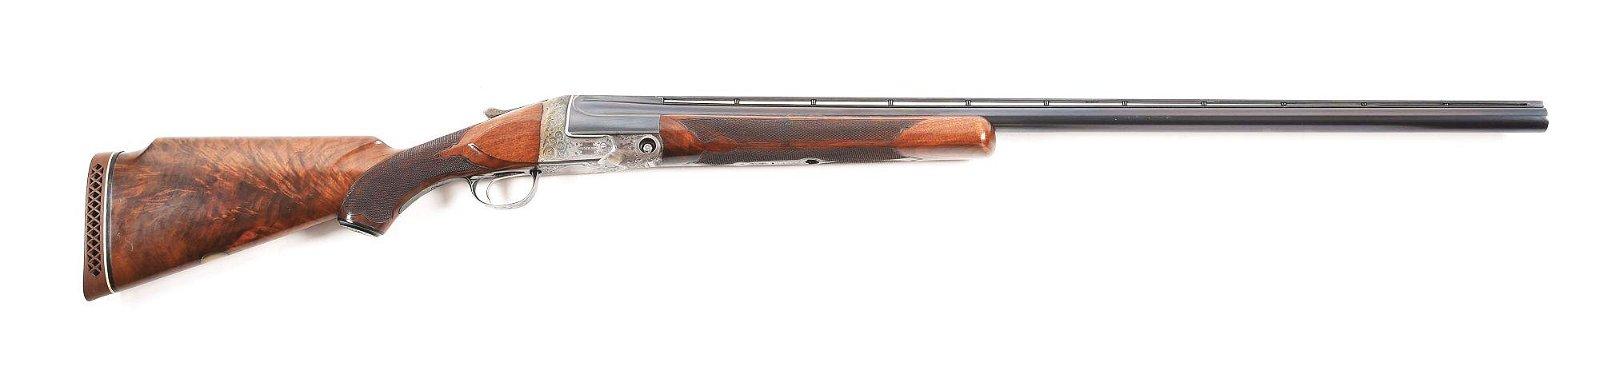 (C) PARKER SC 12 GAUGE SINGLE SHOT SHOTGUN.